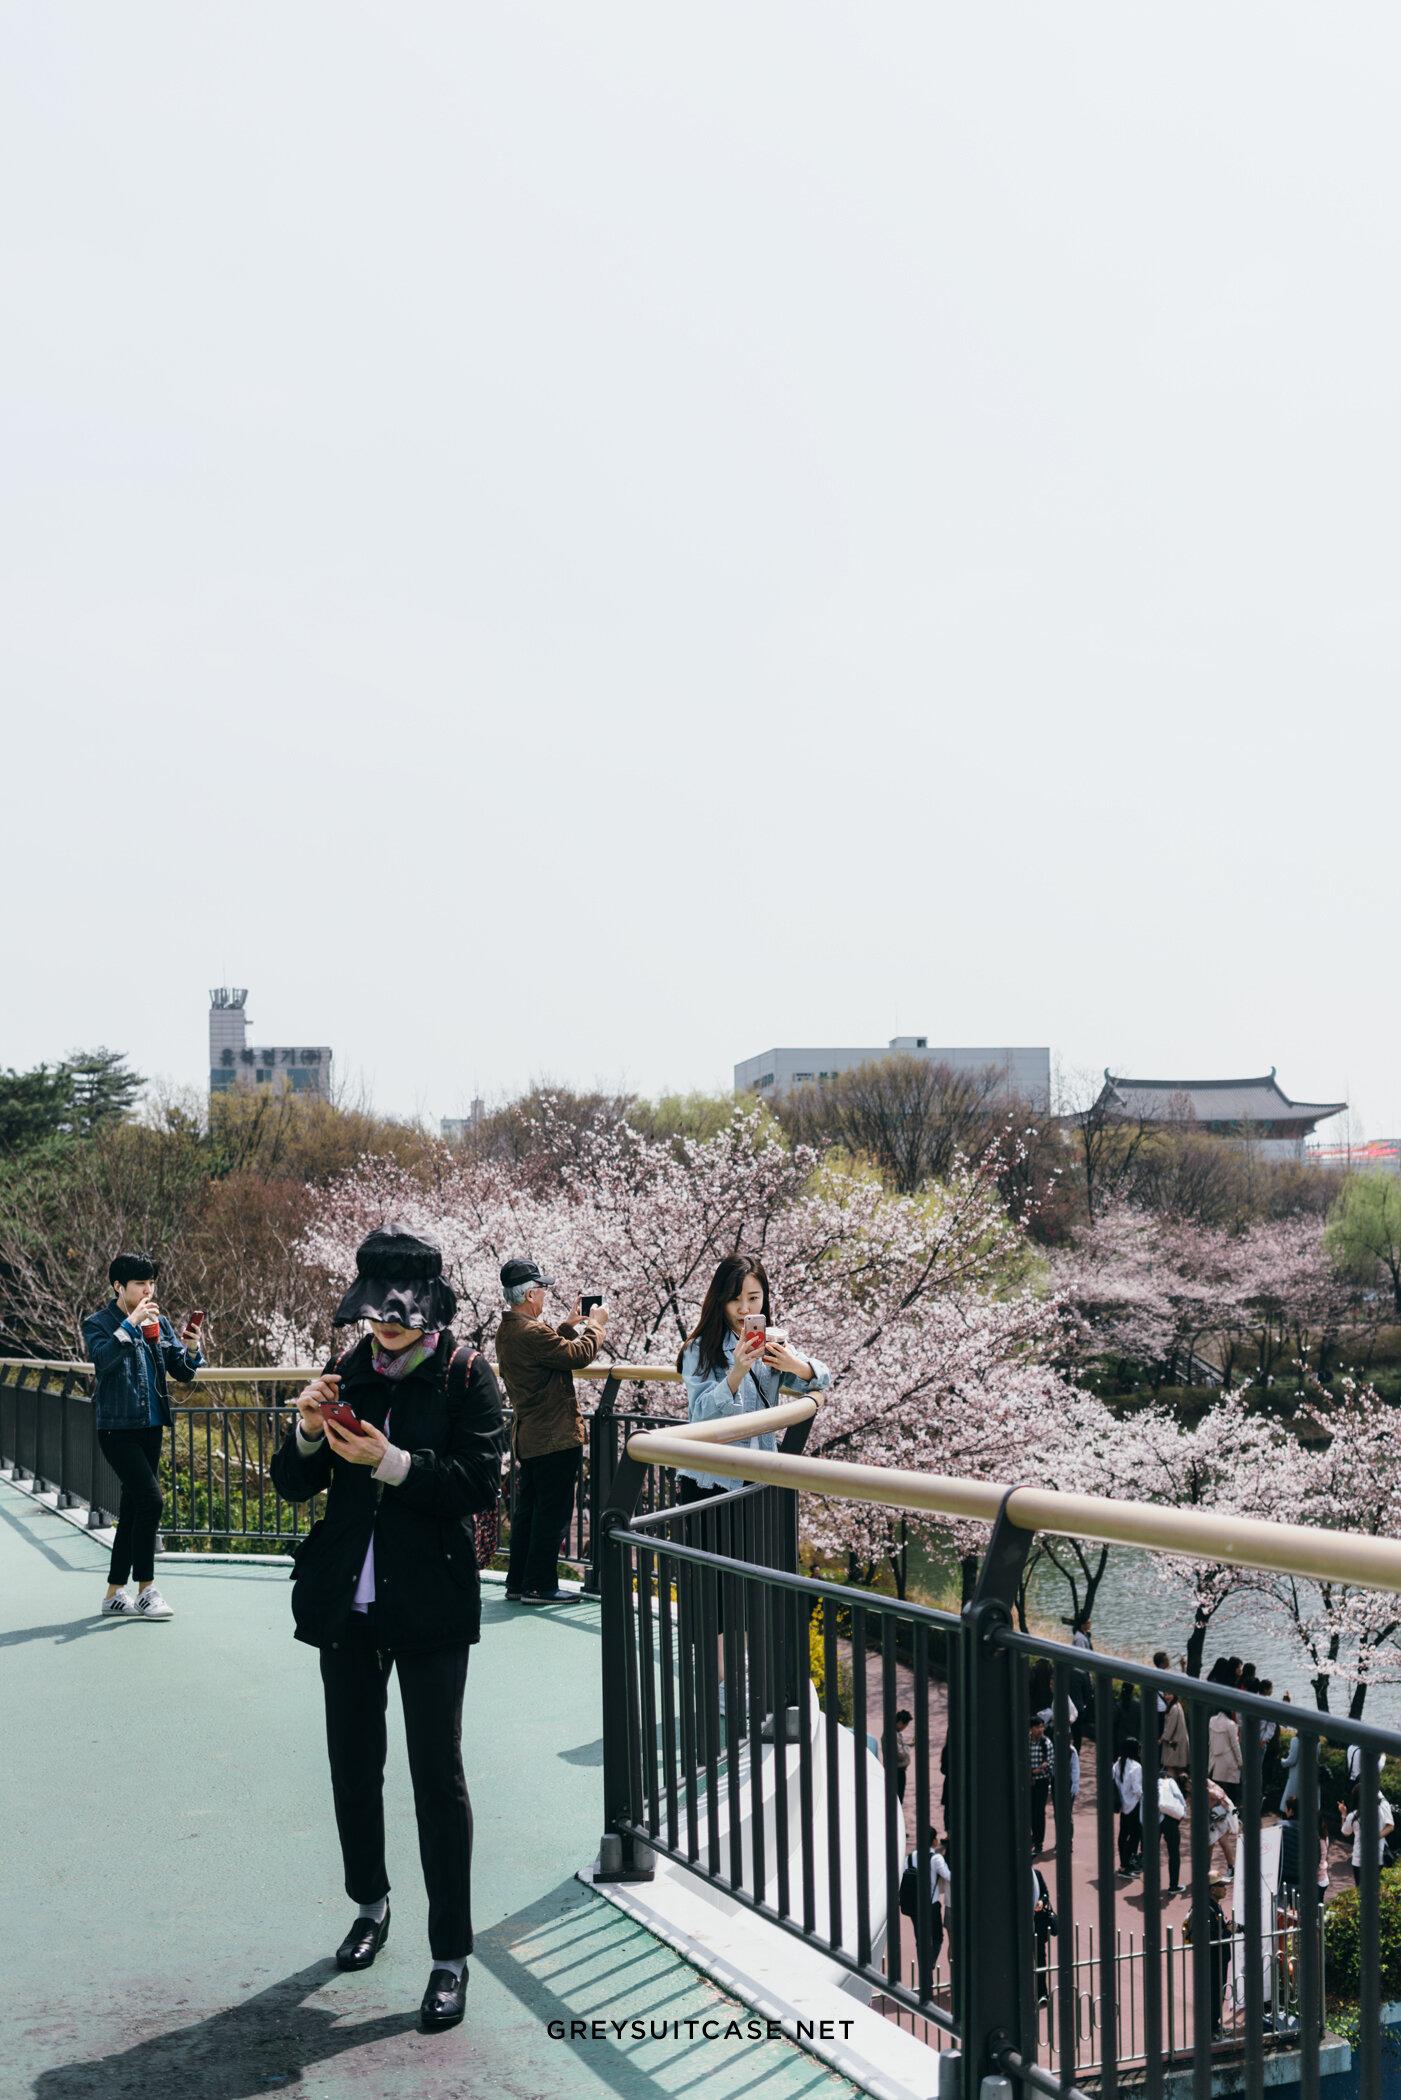 Greysuitcase Travel Series - Seoul Spring '17 - Seokchon Lake Park (석촌호수공원), Seoul, South Korea